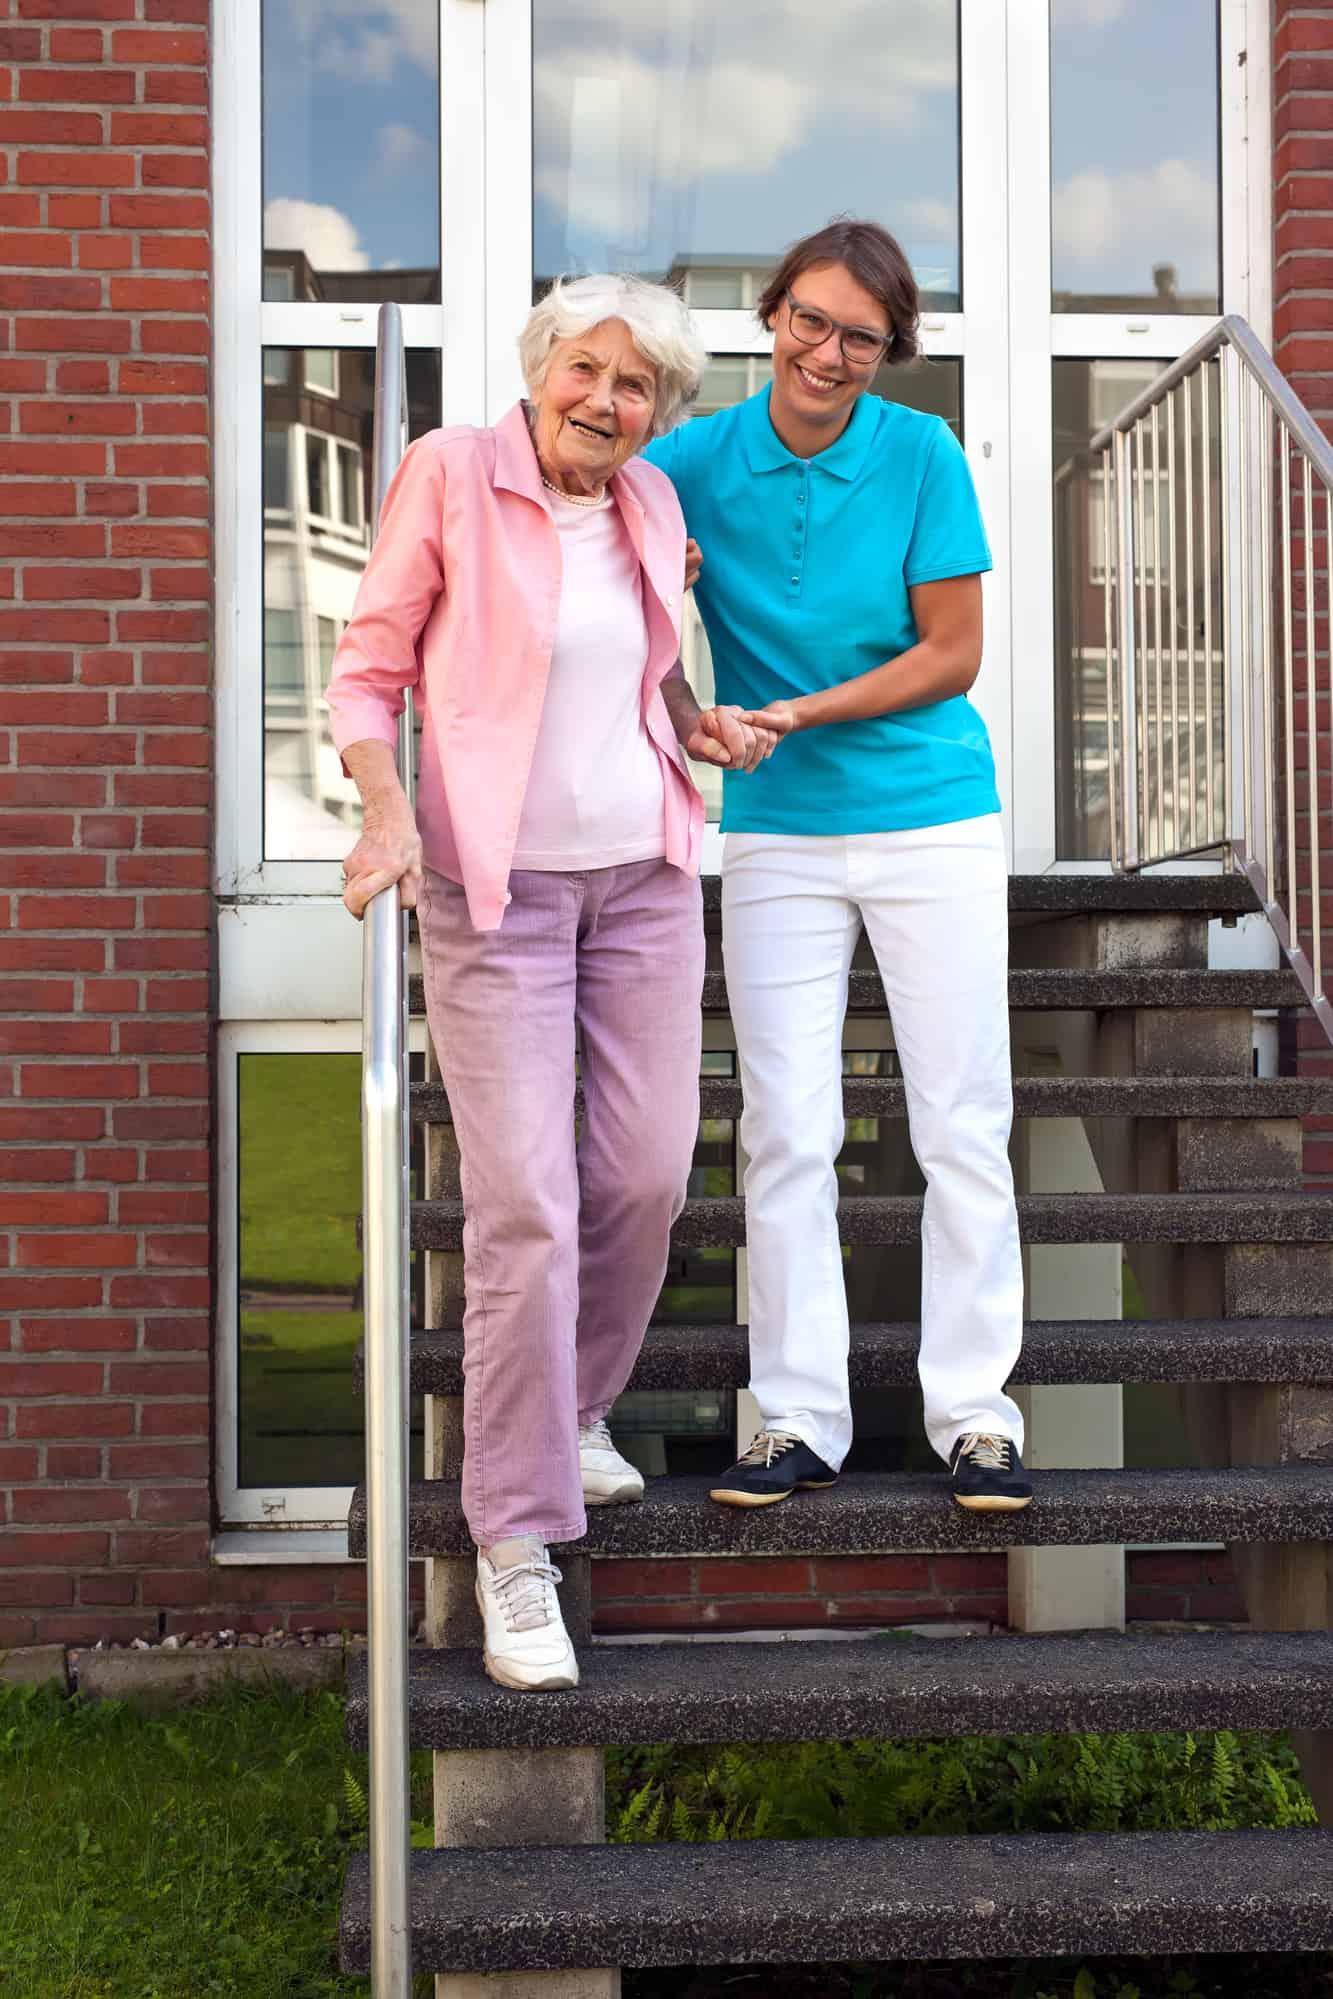 norwalk senior services